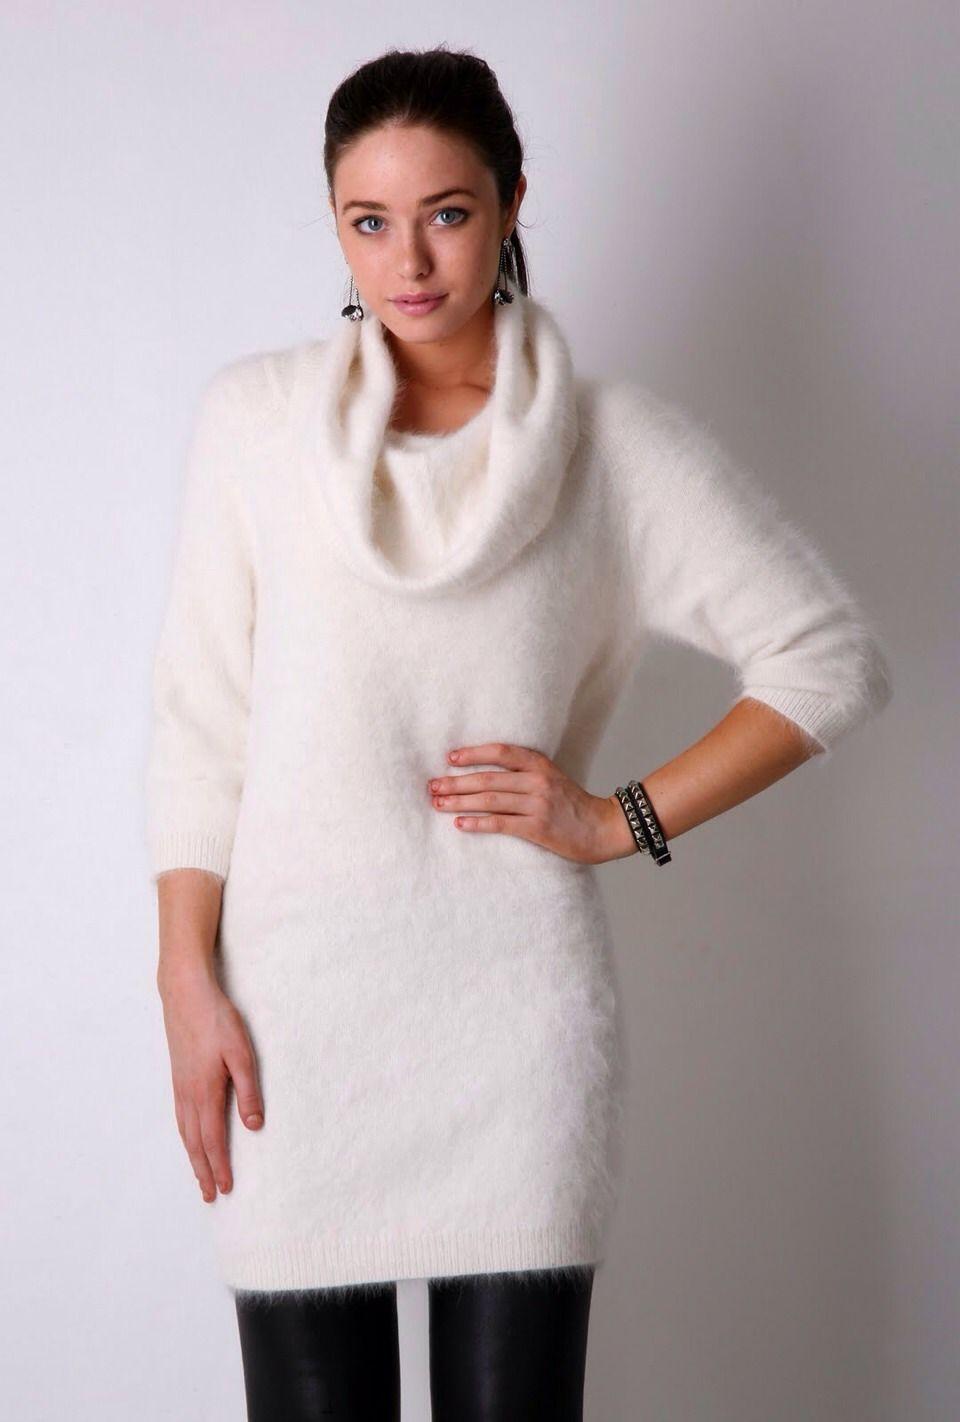 Stop Angora or Mohair Sweater Shedding | Trusper Faves | Pinterest ...